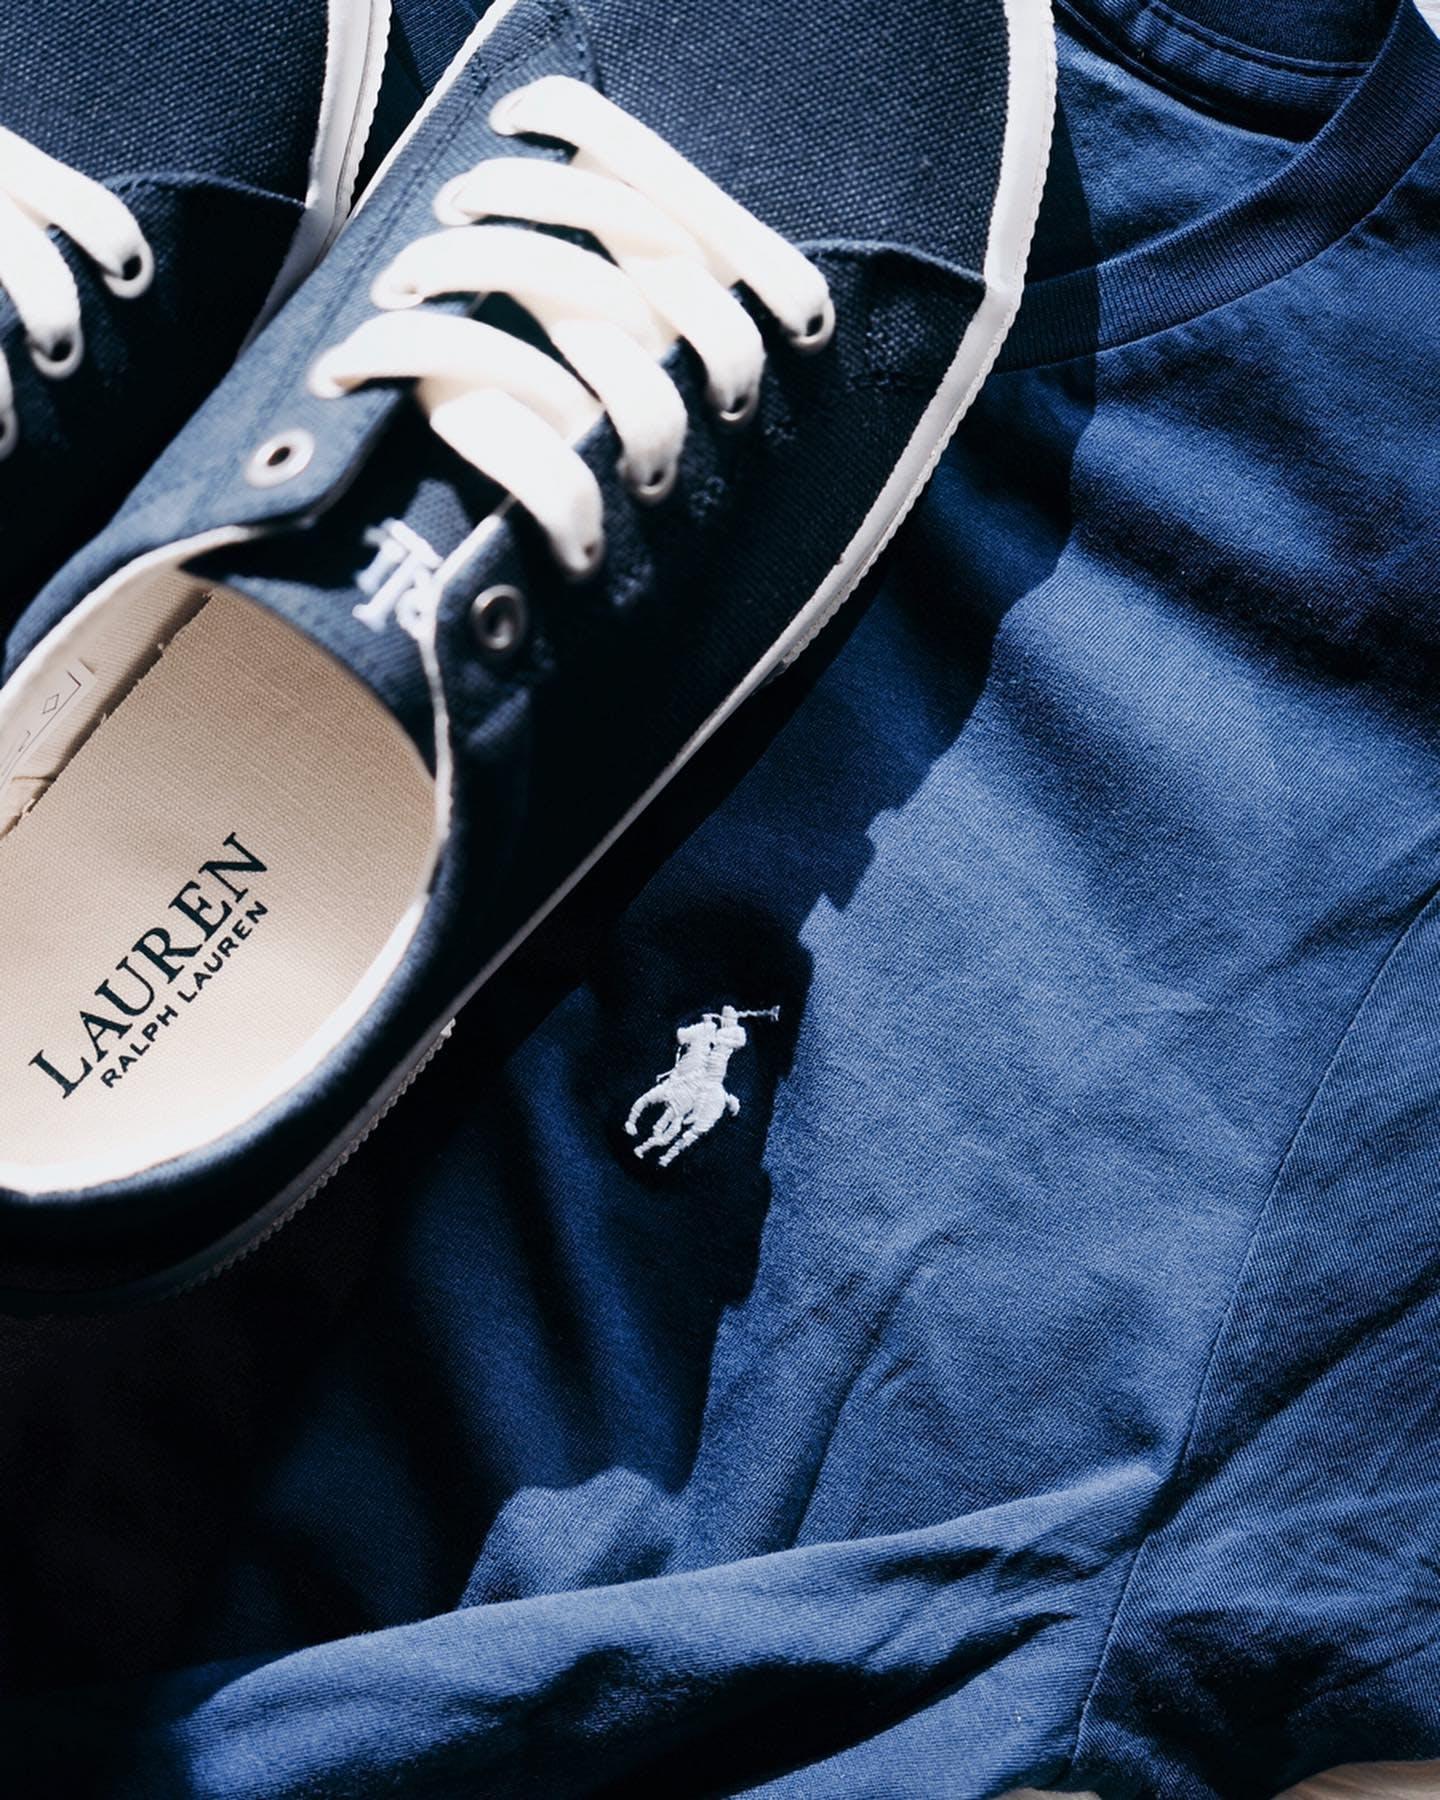 Polo Ralph Lauren, Skor Nordens största utbud av skor